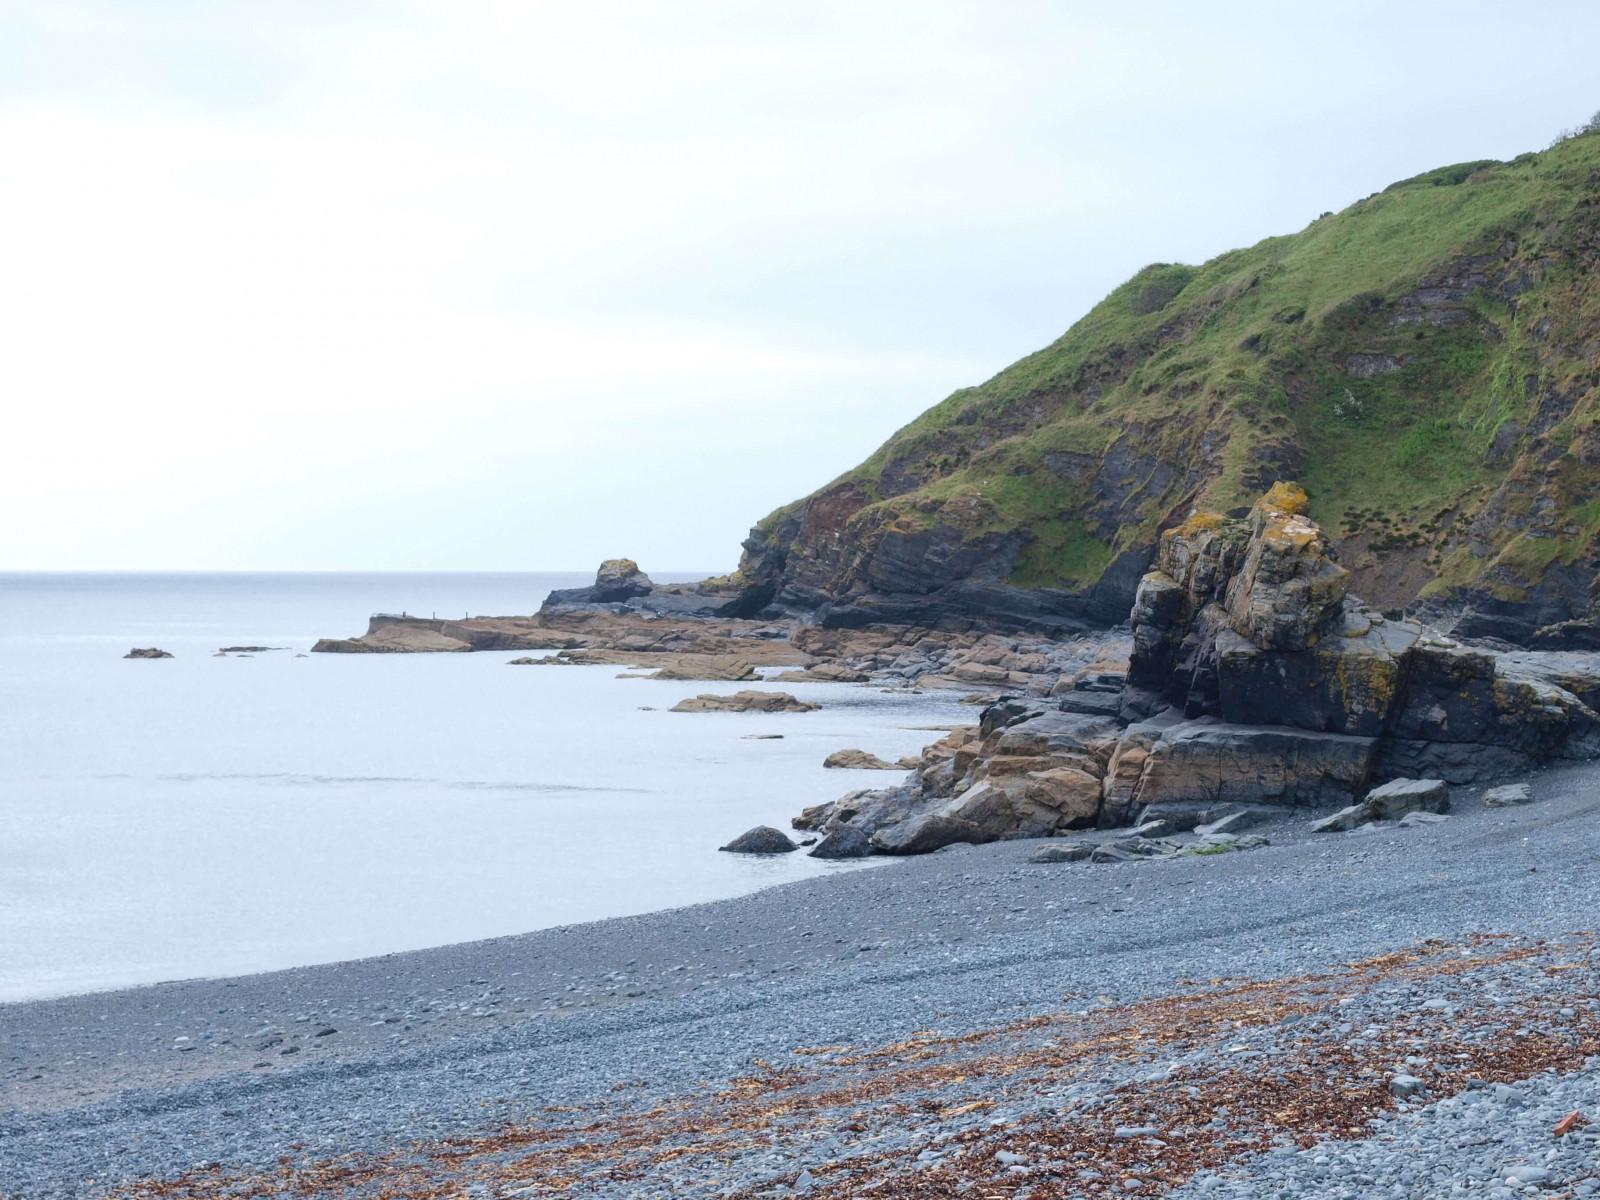 Scuba Dive at Drawna Rocks (12)